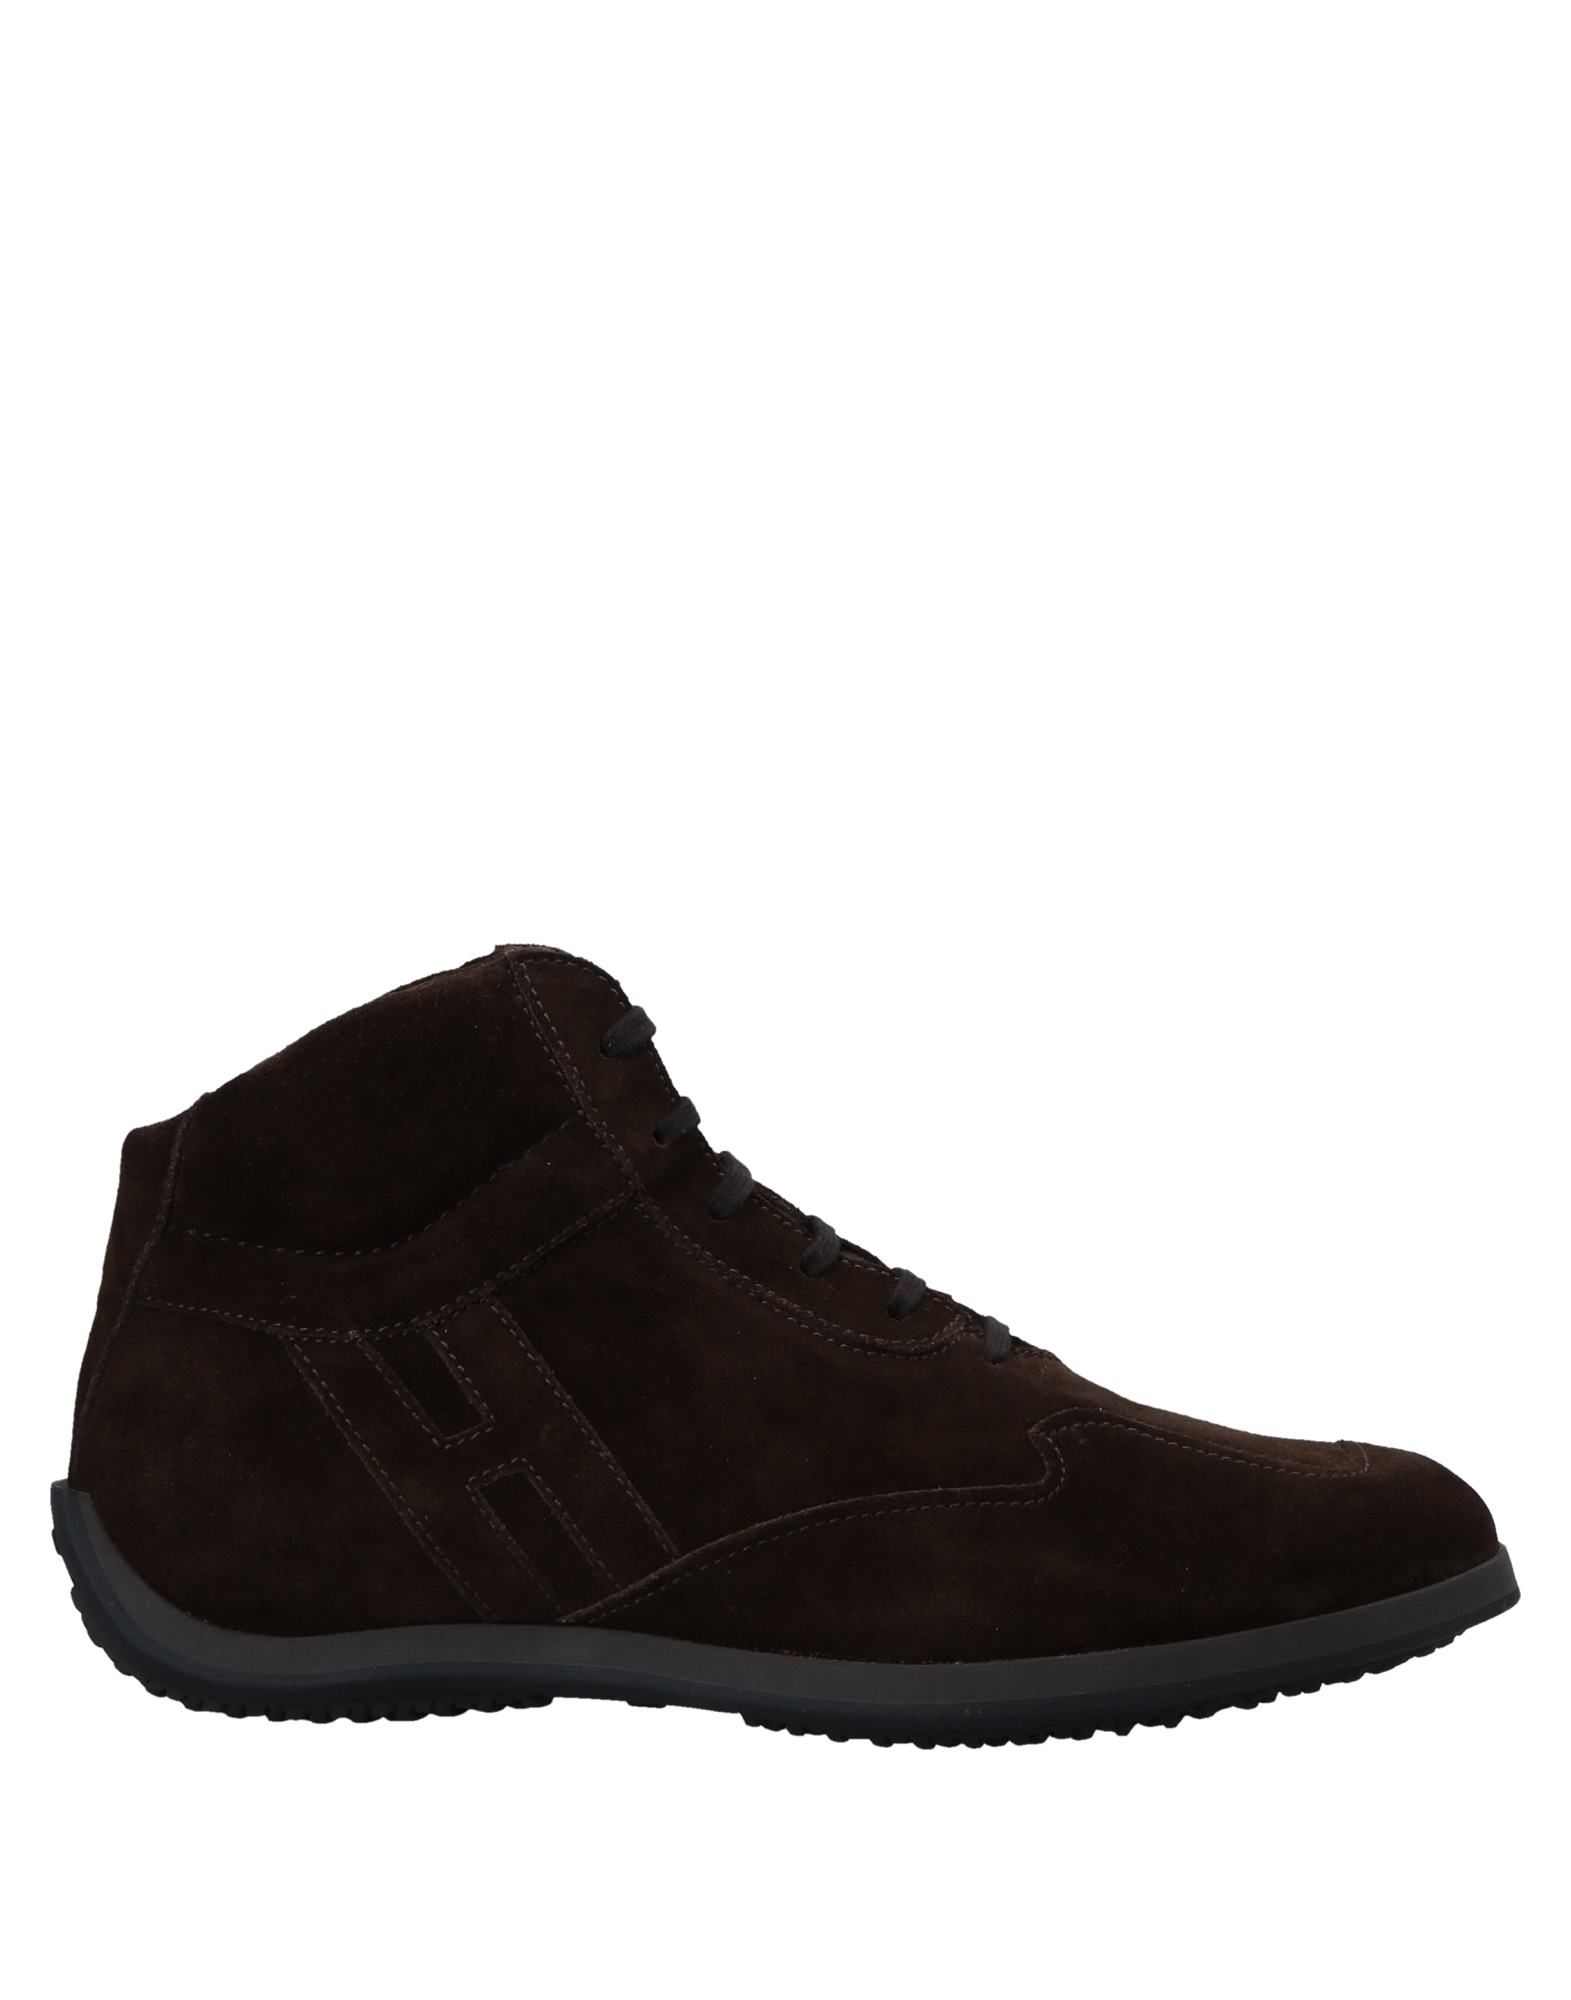 Hogan Sneakers Herren  11559939PT Gute Qualität beliebte Schuhe